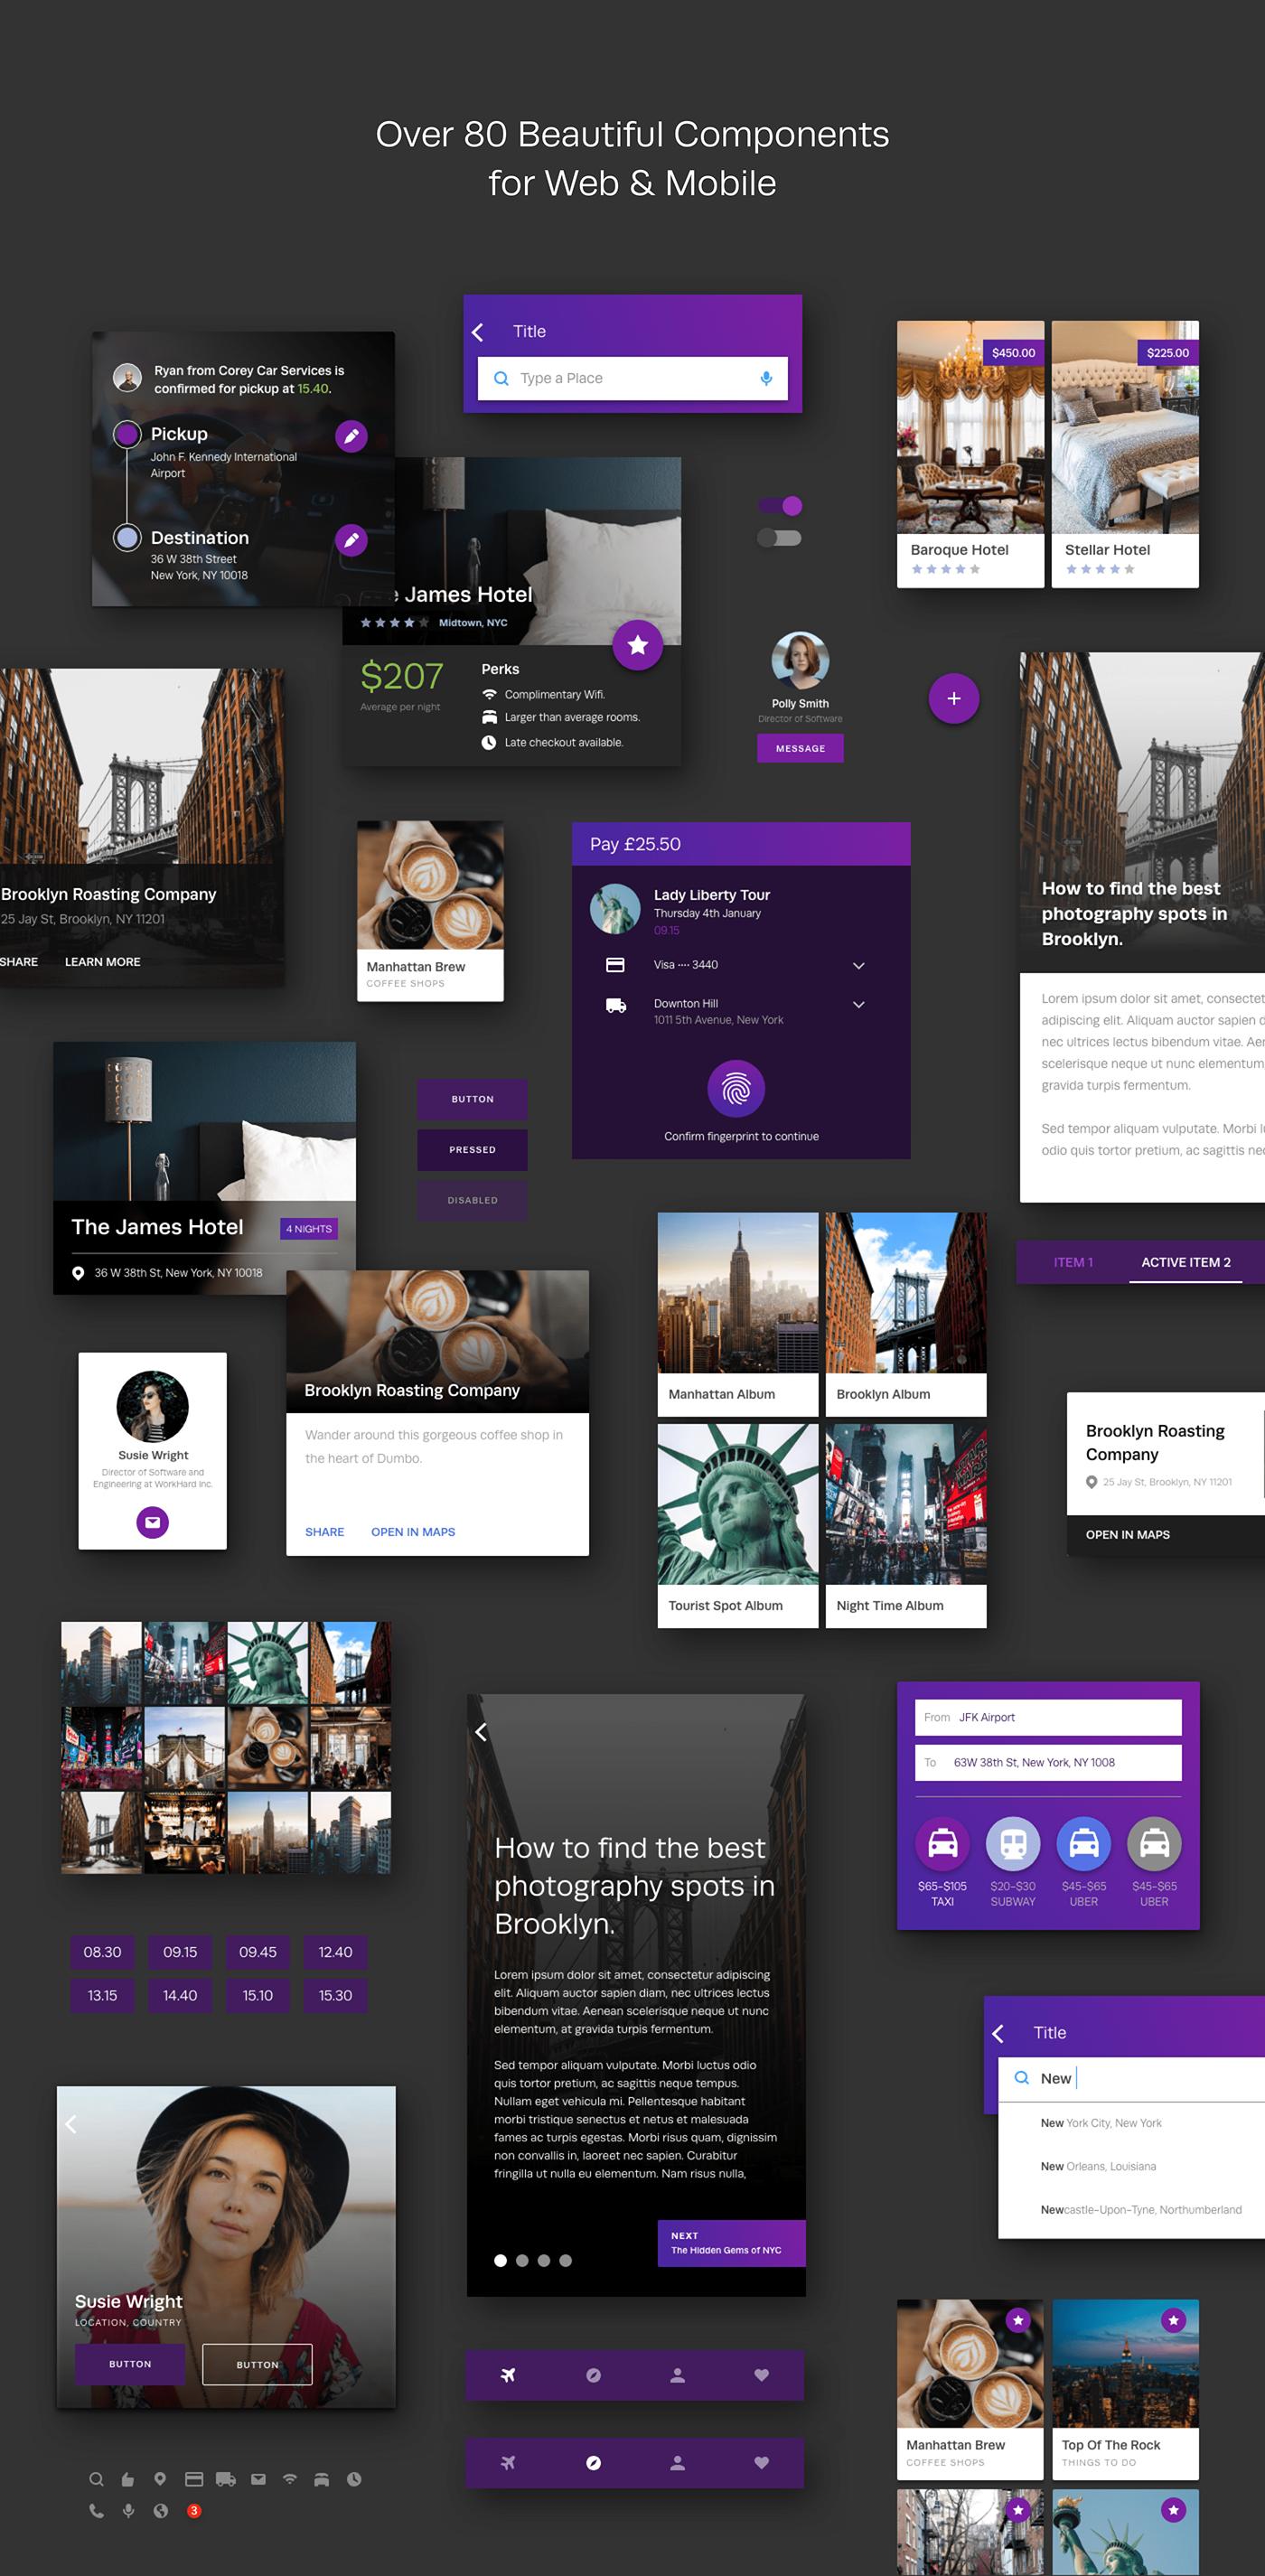 user interface design Adobe XD User Experience Design ux UI graphic design